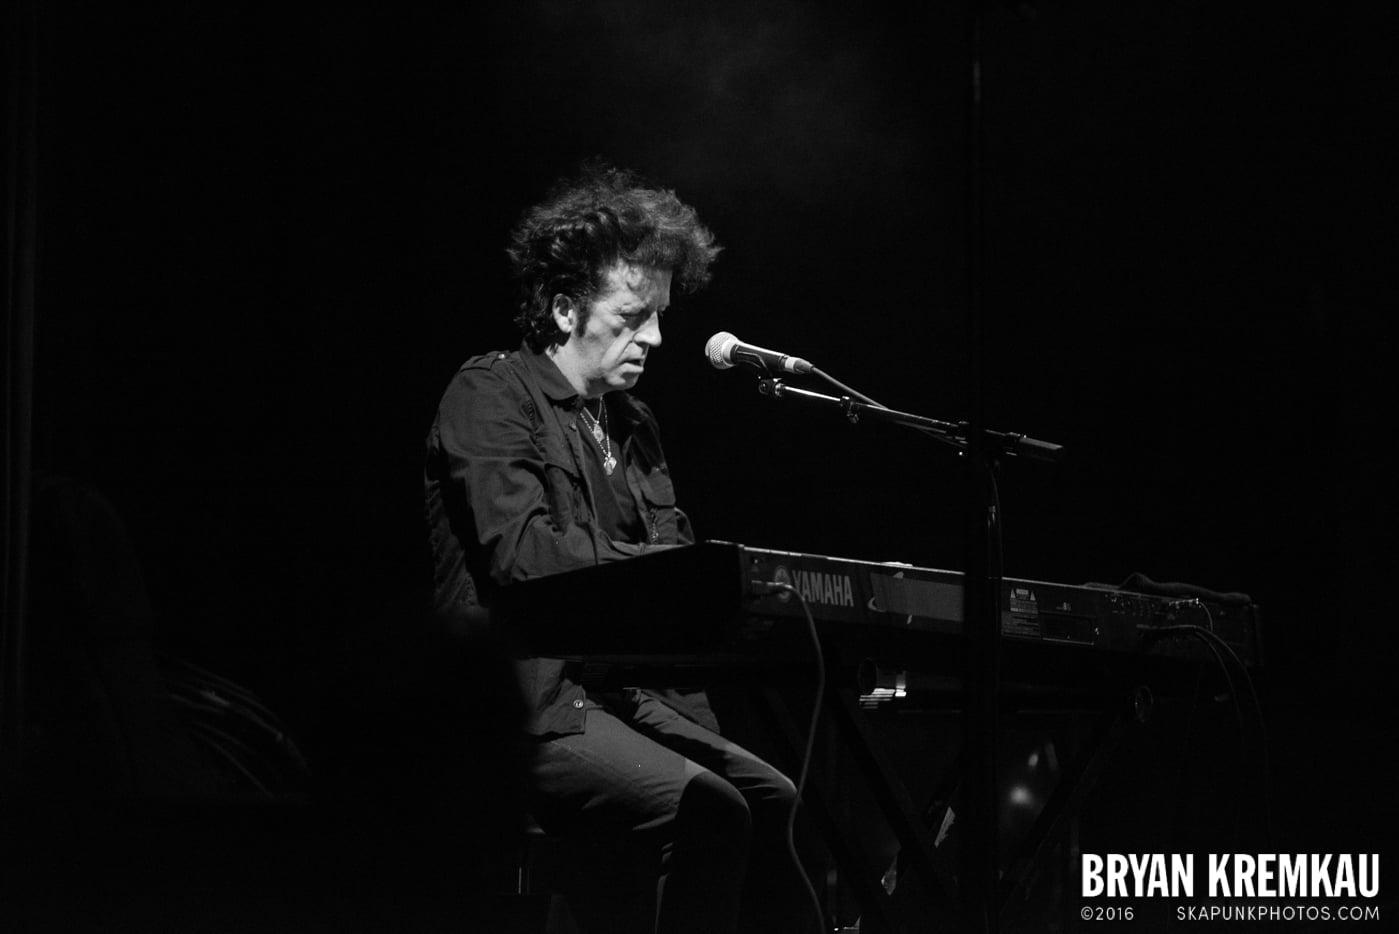 Willie Nile @ Highline Ballroom, NYC - 12.26.14 (32)